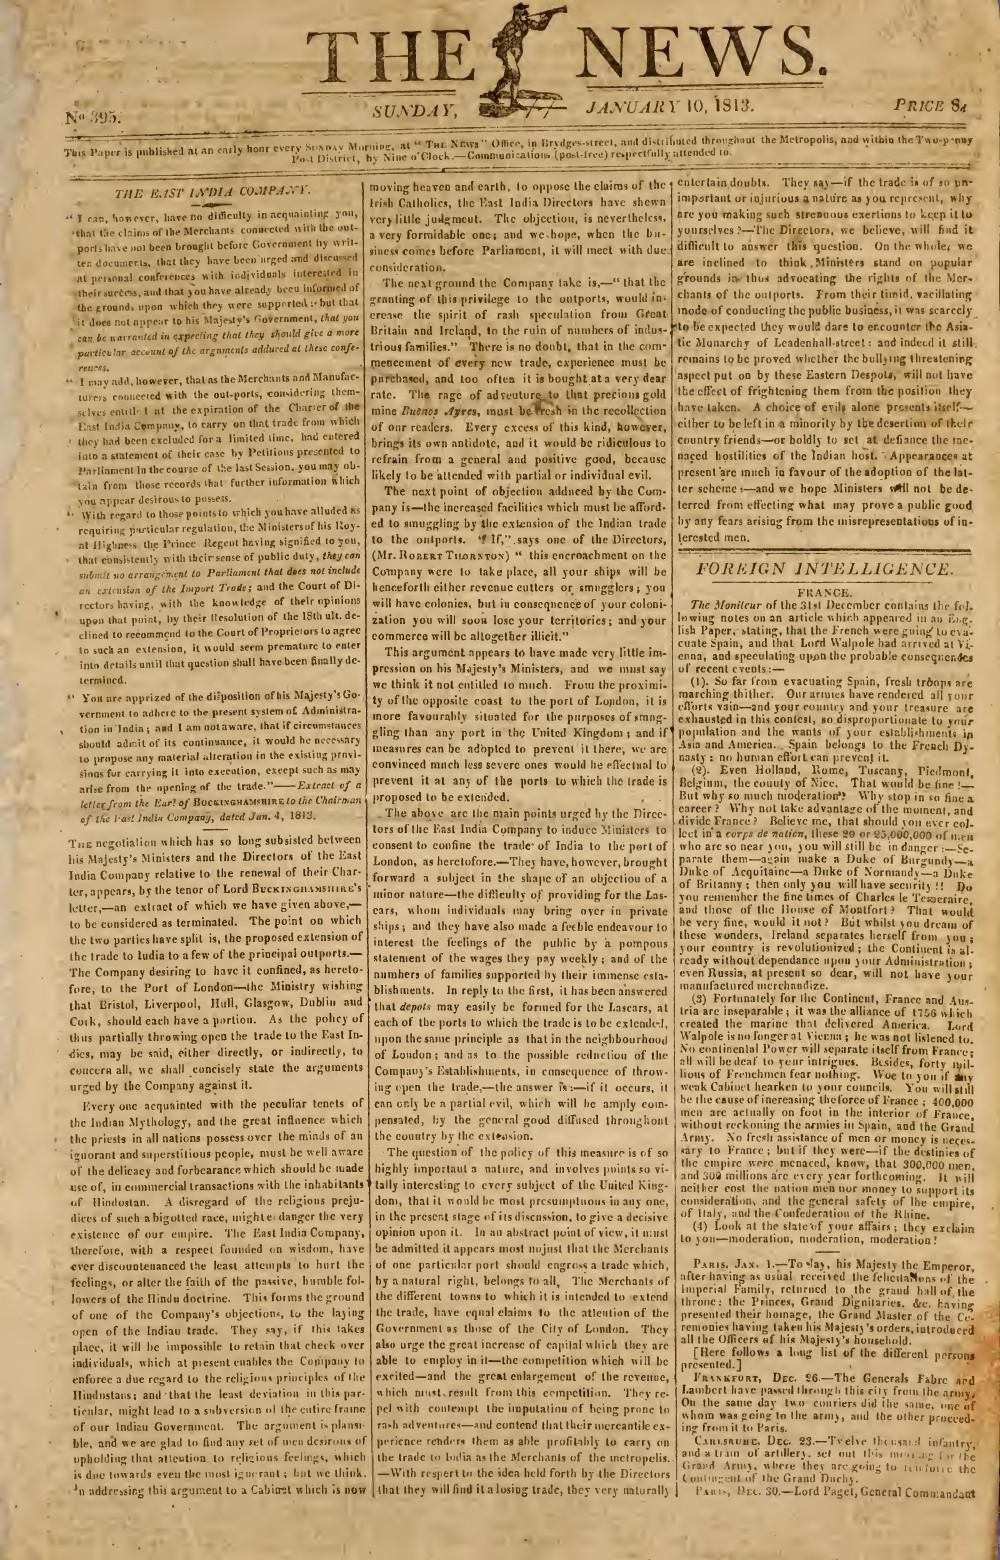 The News, 10 January 1813, No. 395